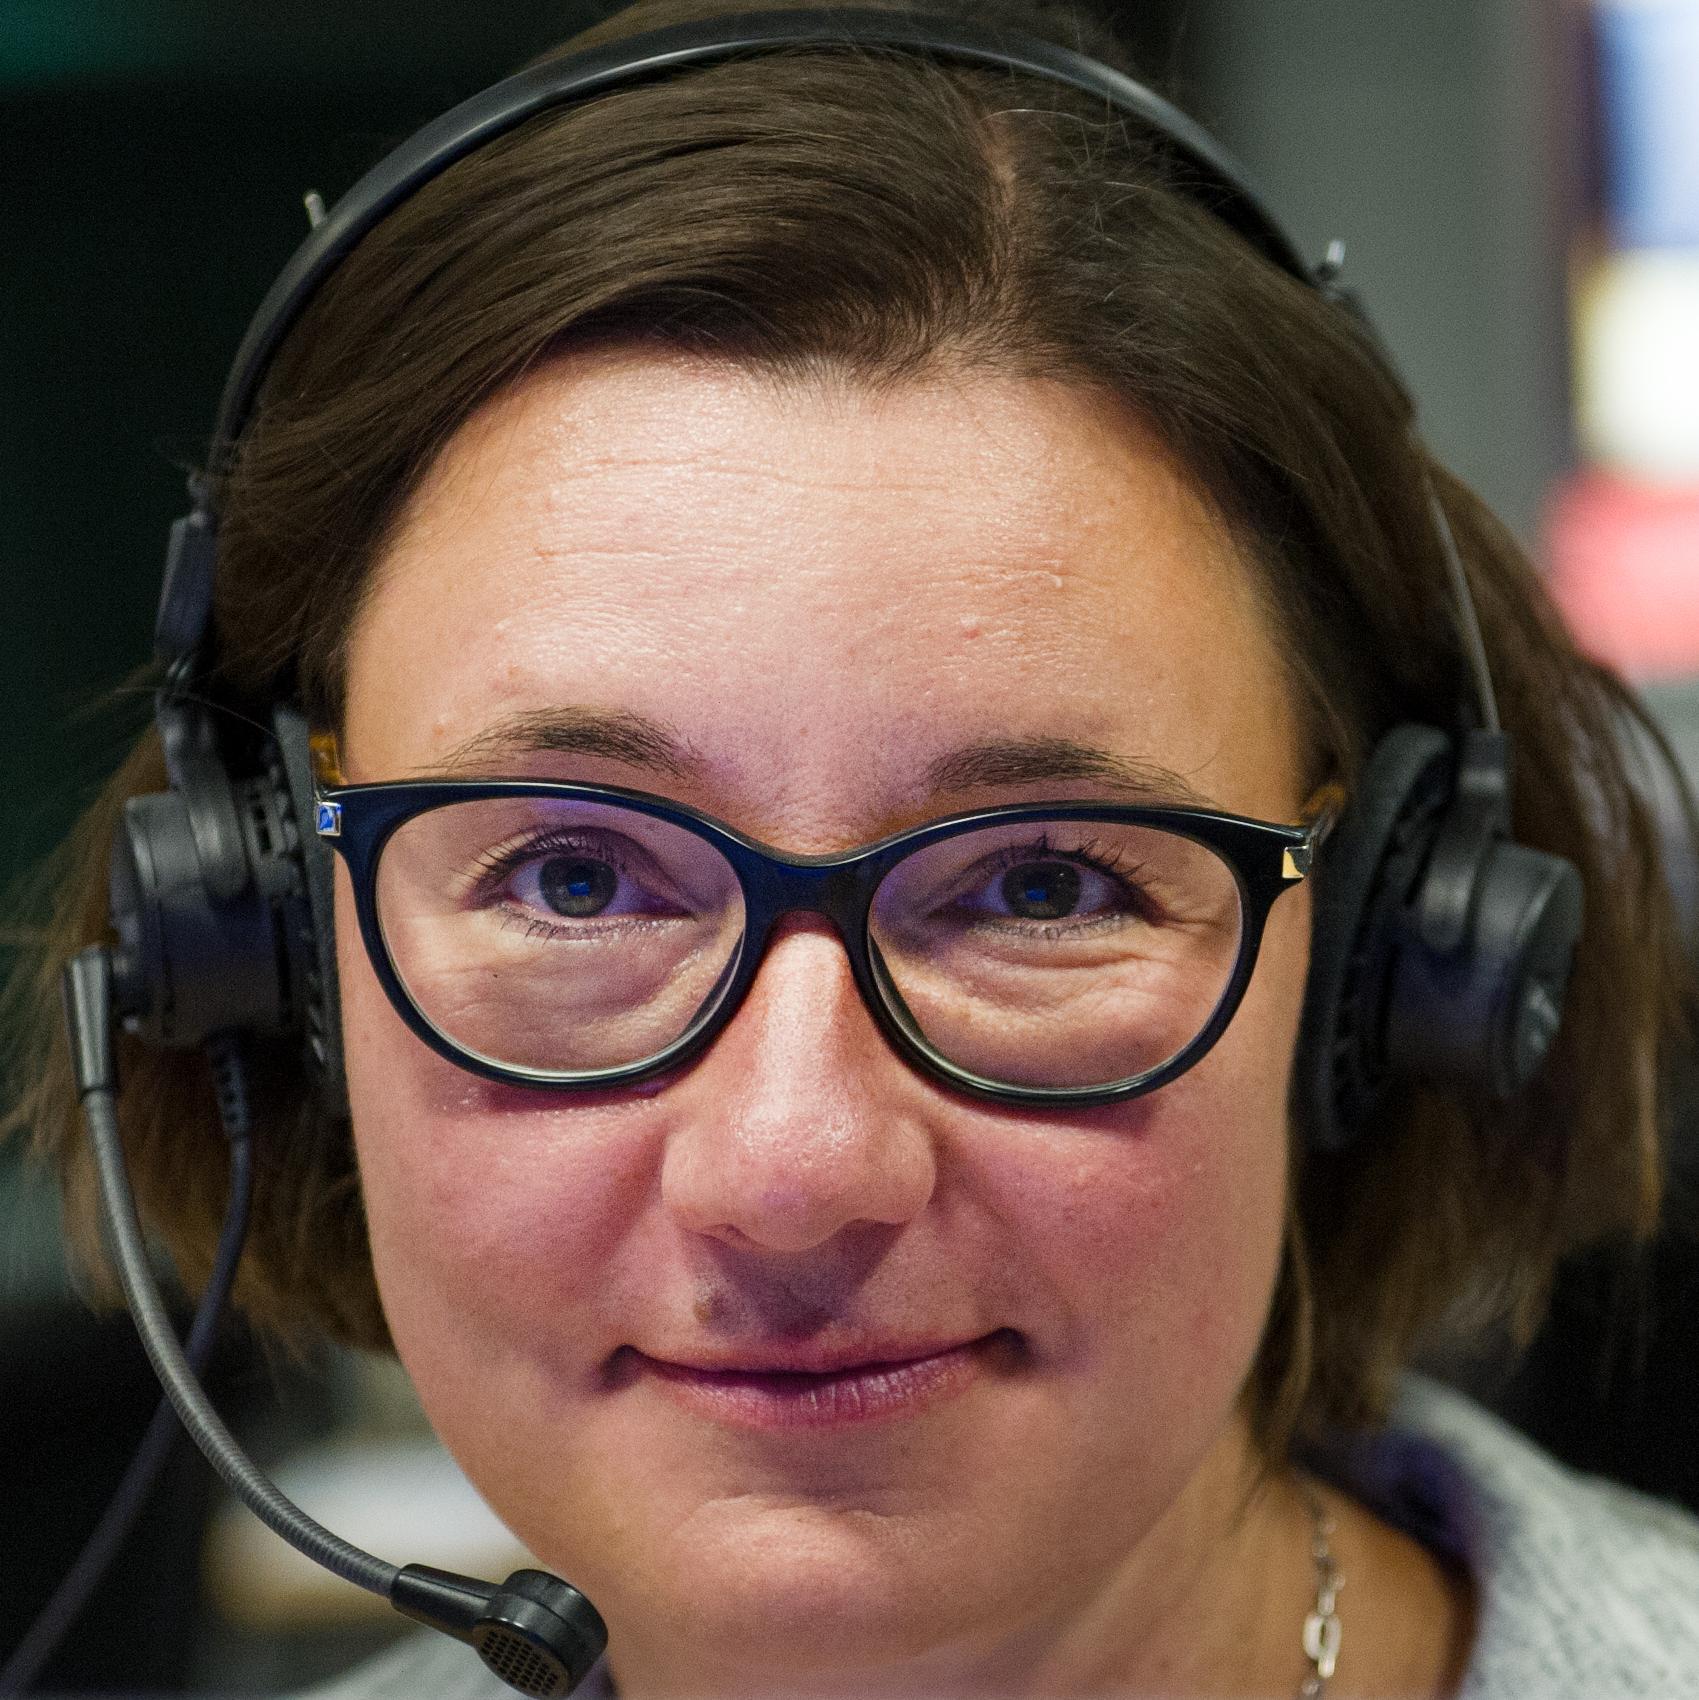 Roana Brogsitter